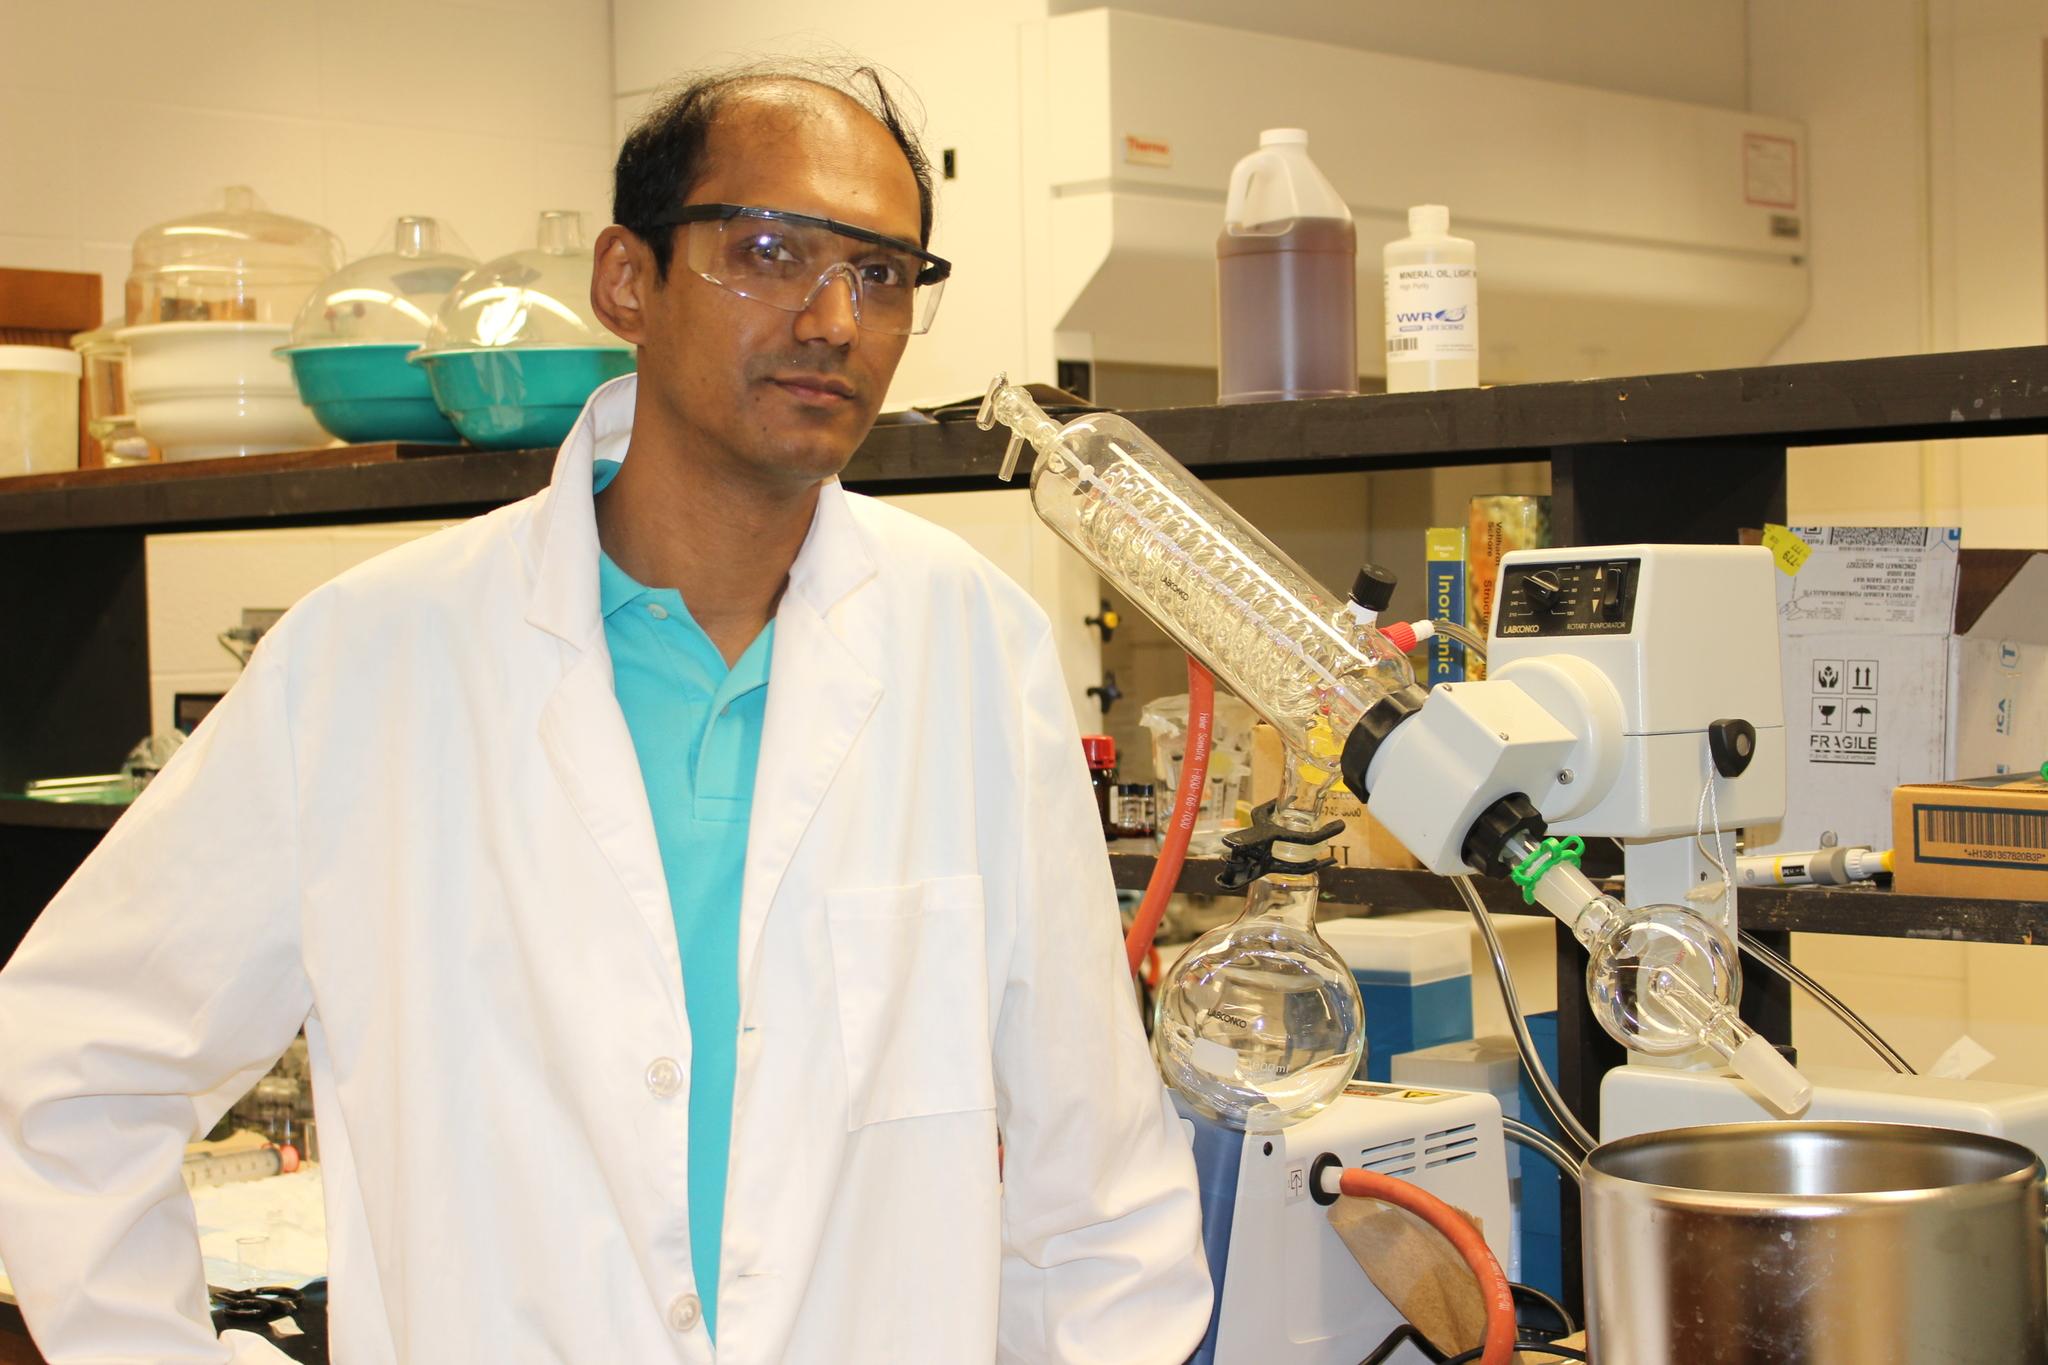 Arnab Dawn, Ph.D. - dawnab@ucmail.uc.eduUniversity of CincinnatiJames L. Winkle College of PharmacyDepartment of Pharmaceutical Sciences